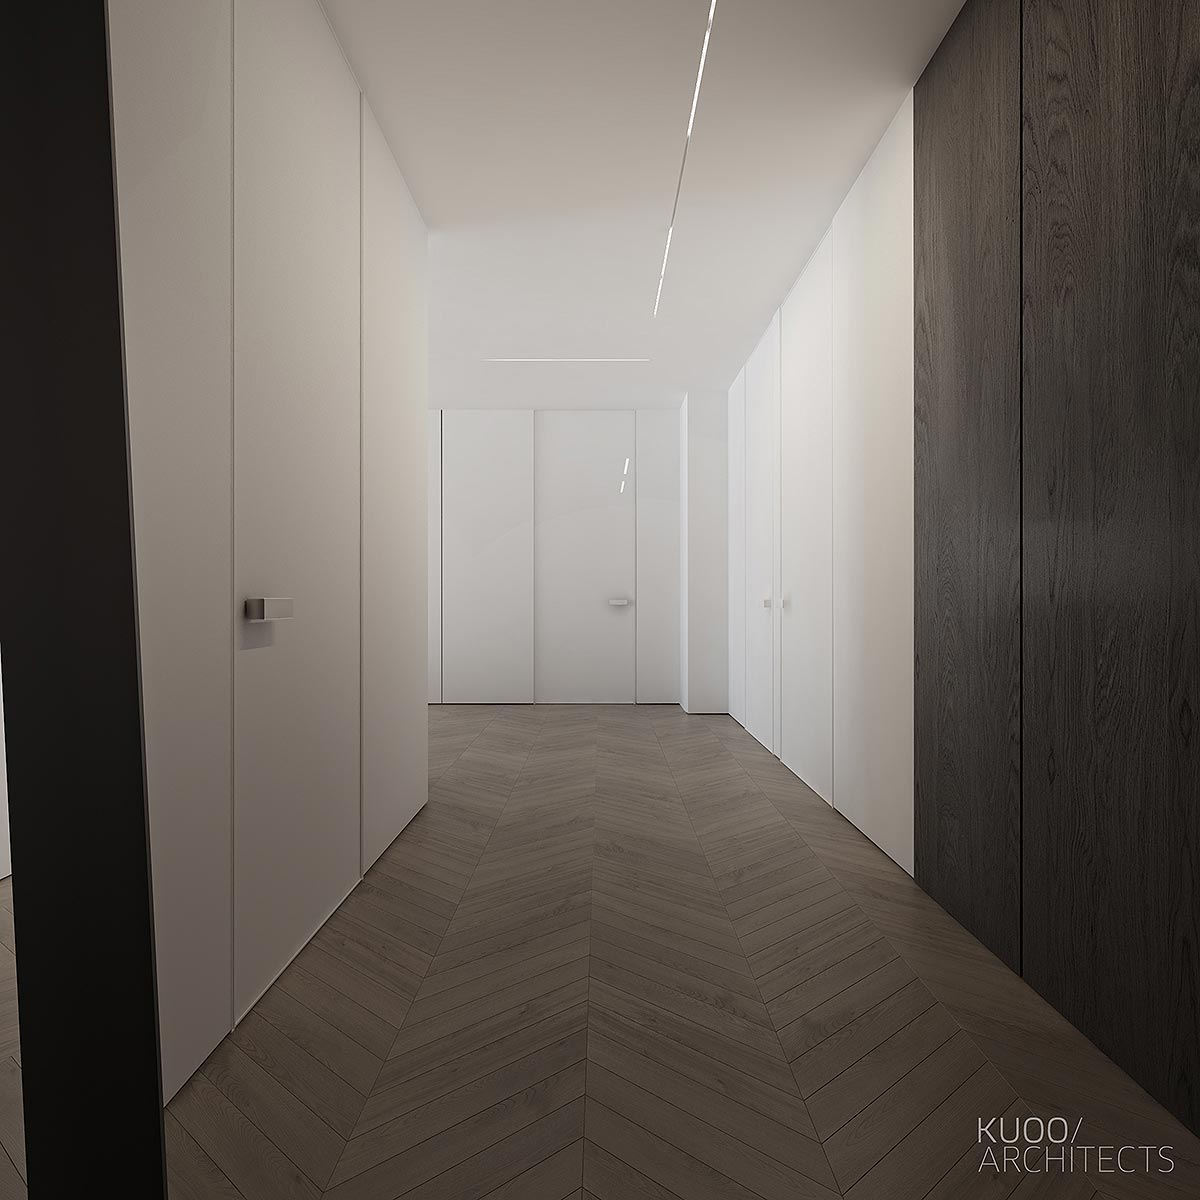 A_kuoo_architects_warsaw_minimal_interiors_contemporaryjpg